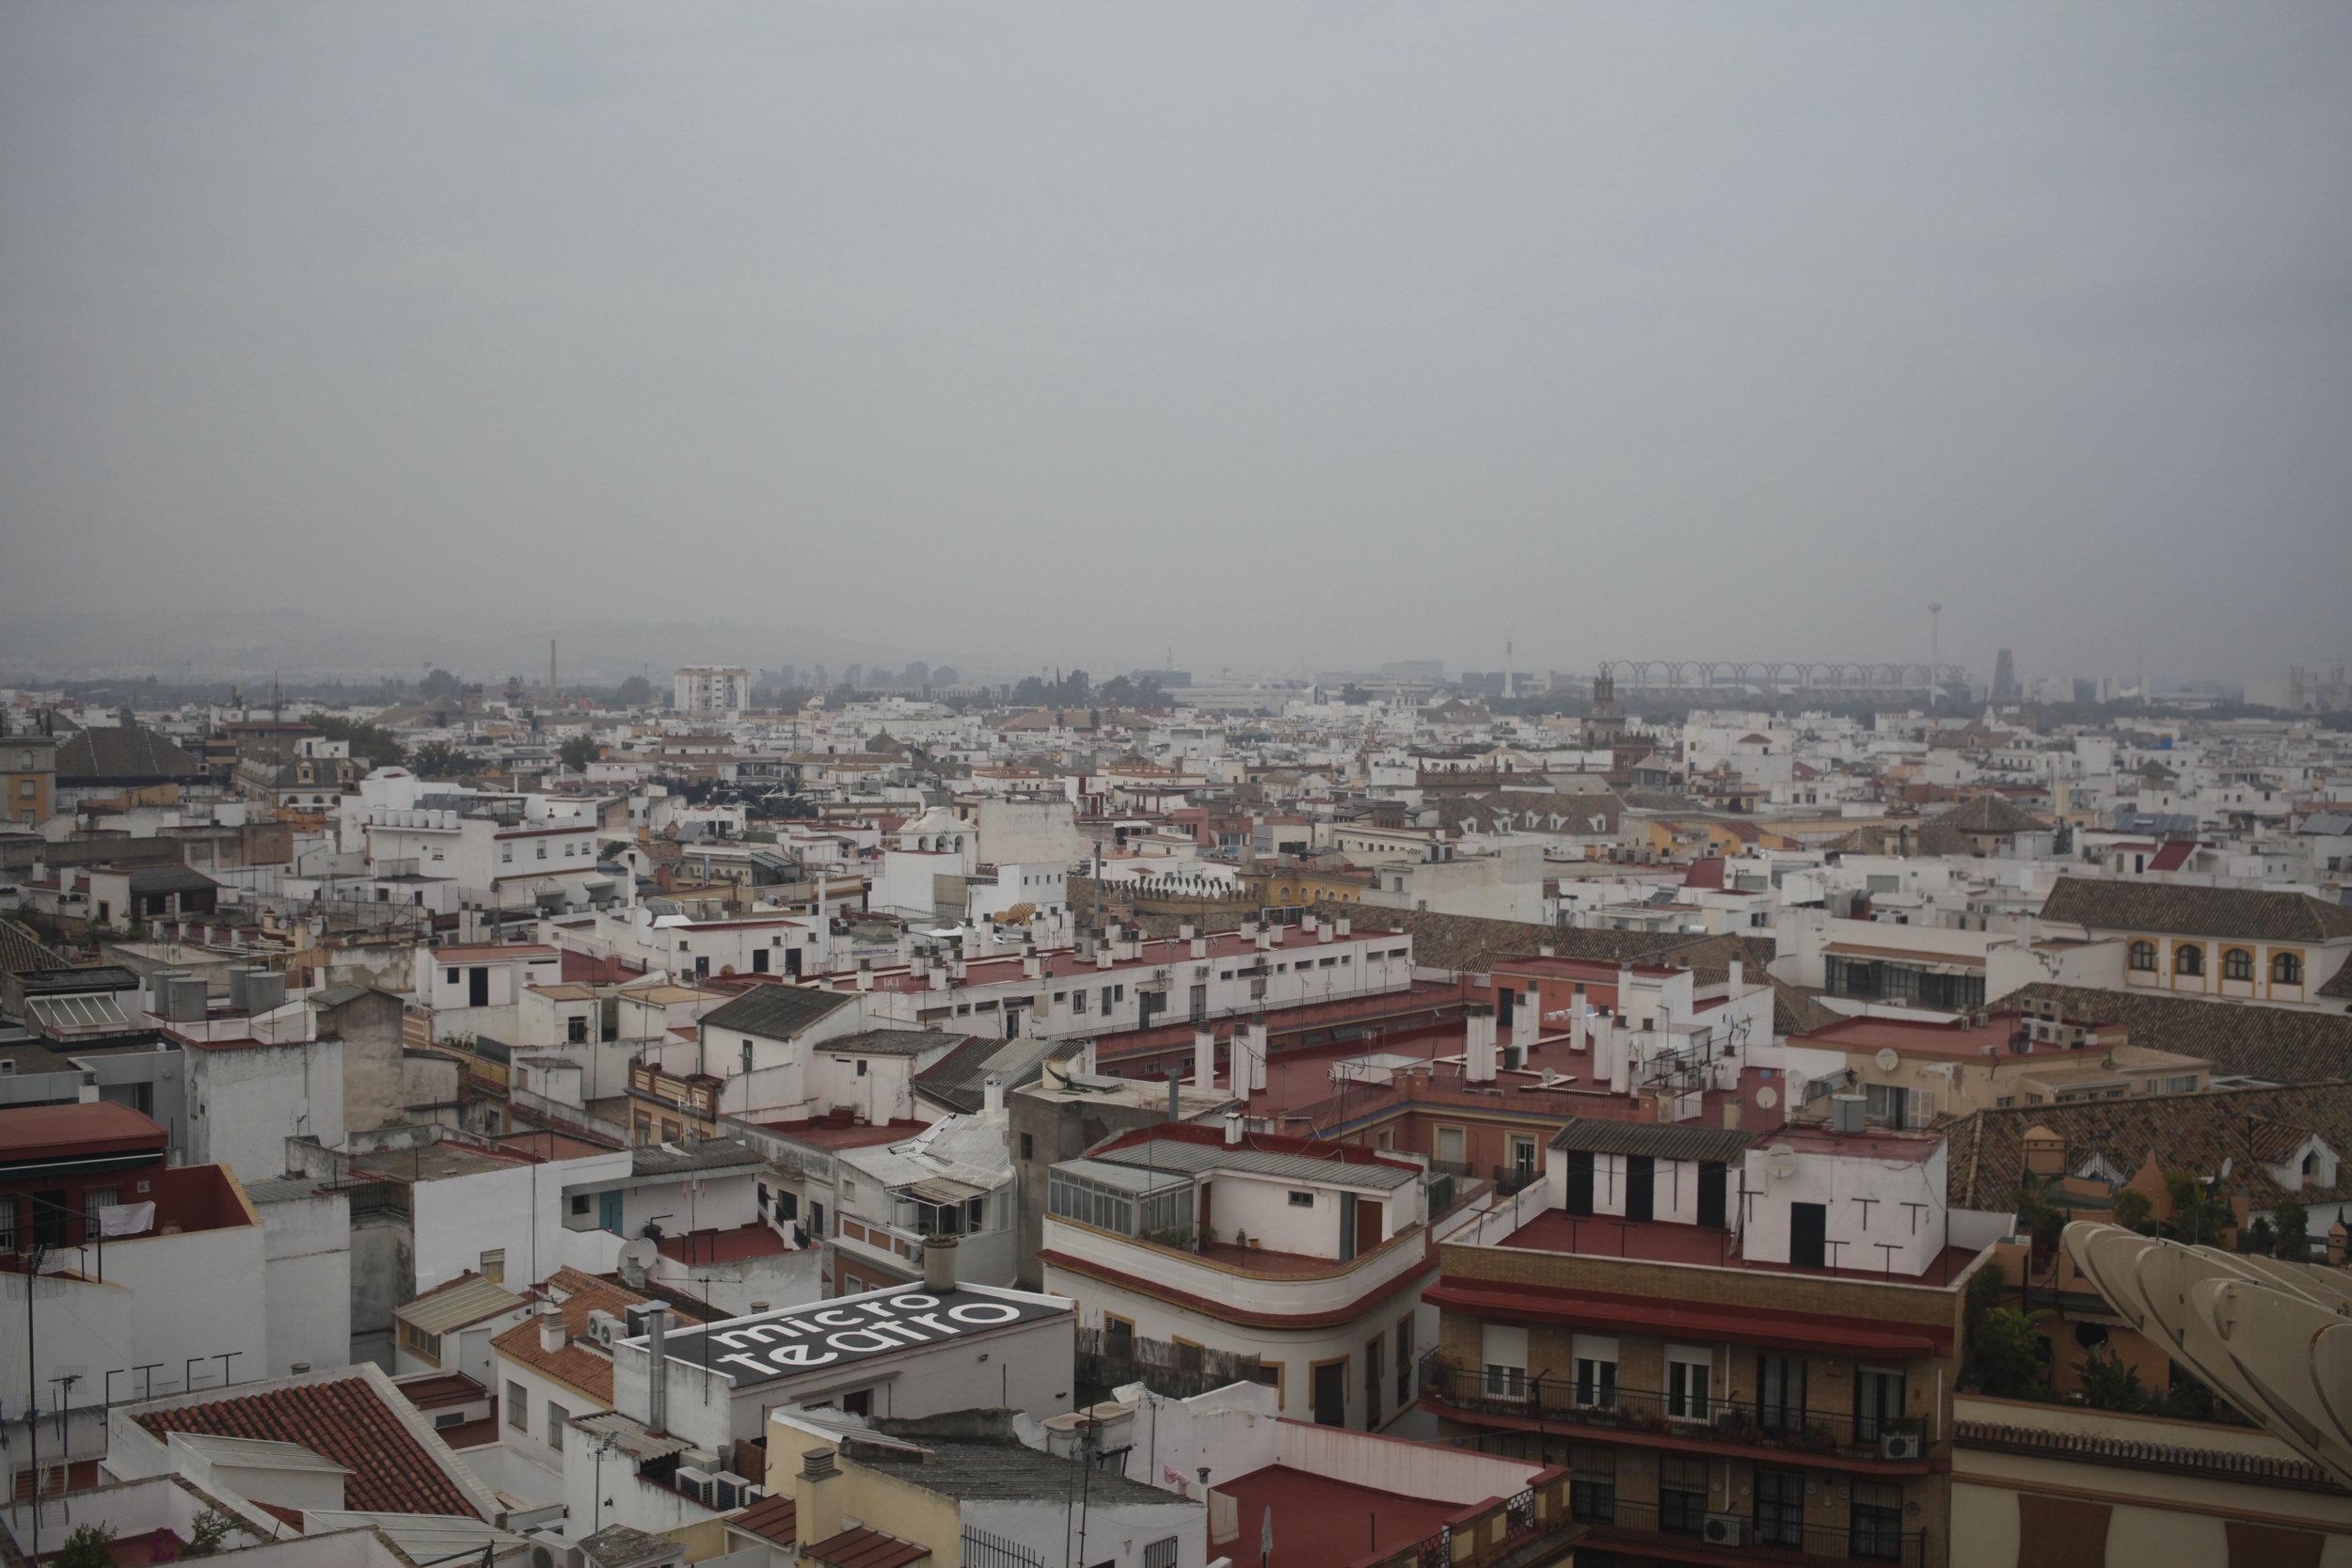 Seville, 2016